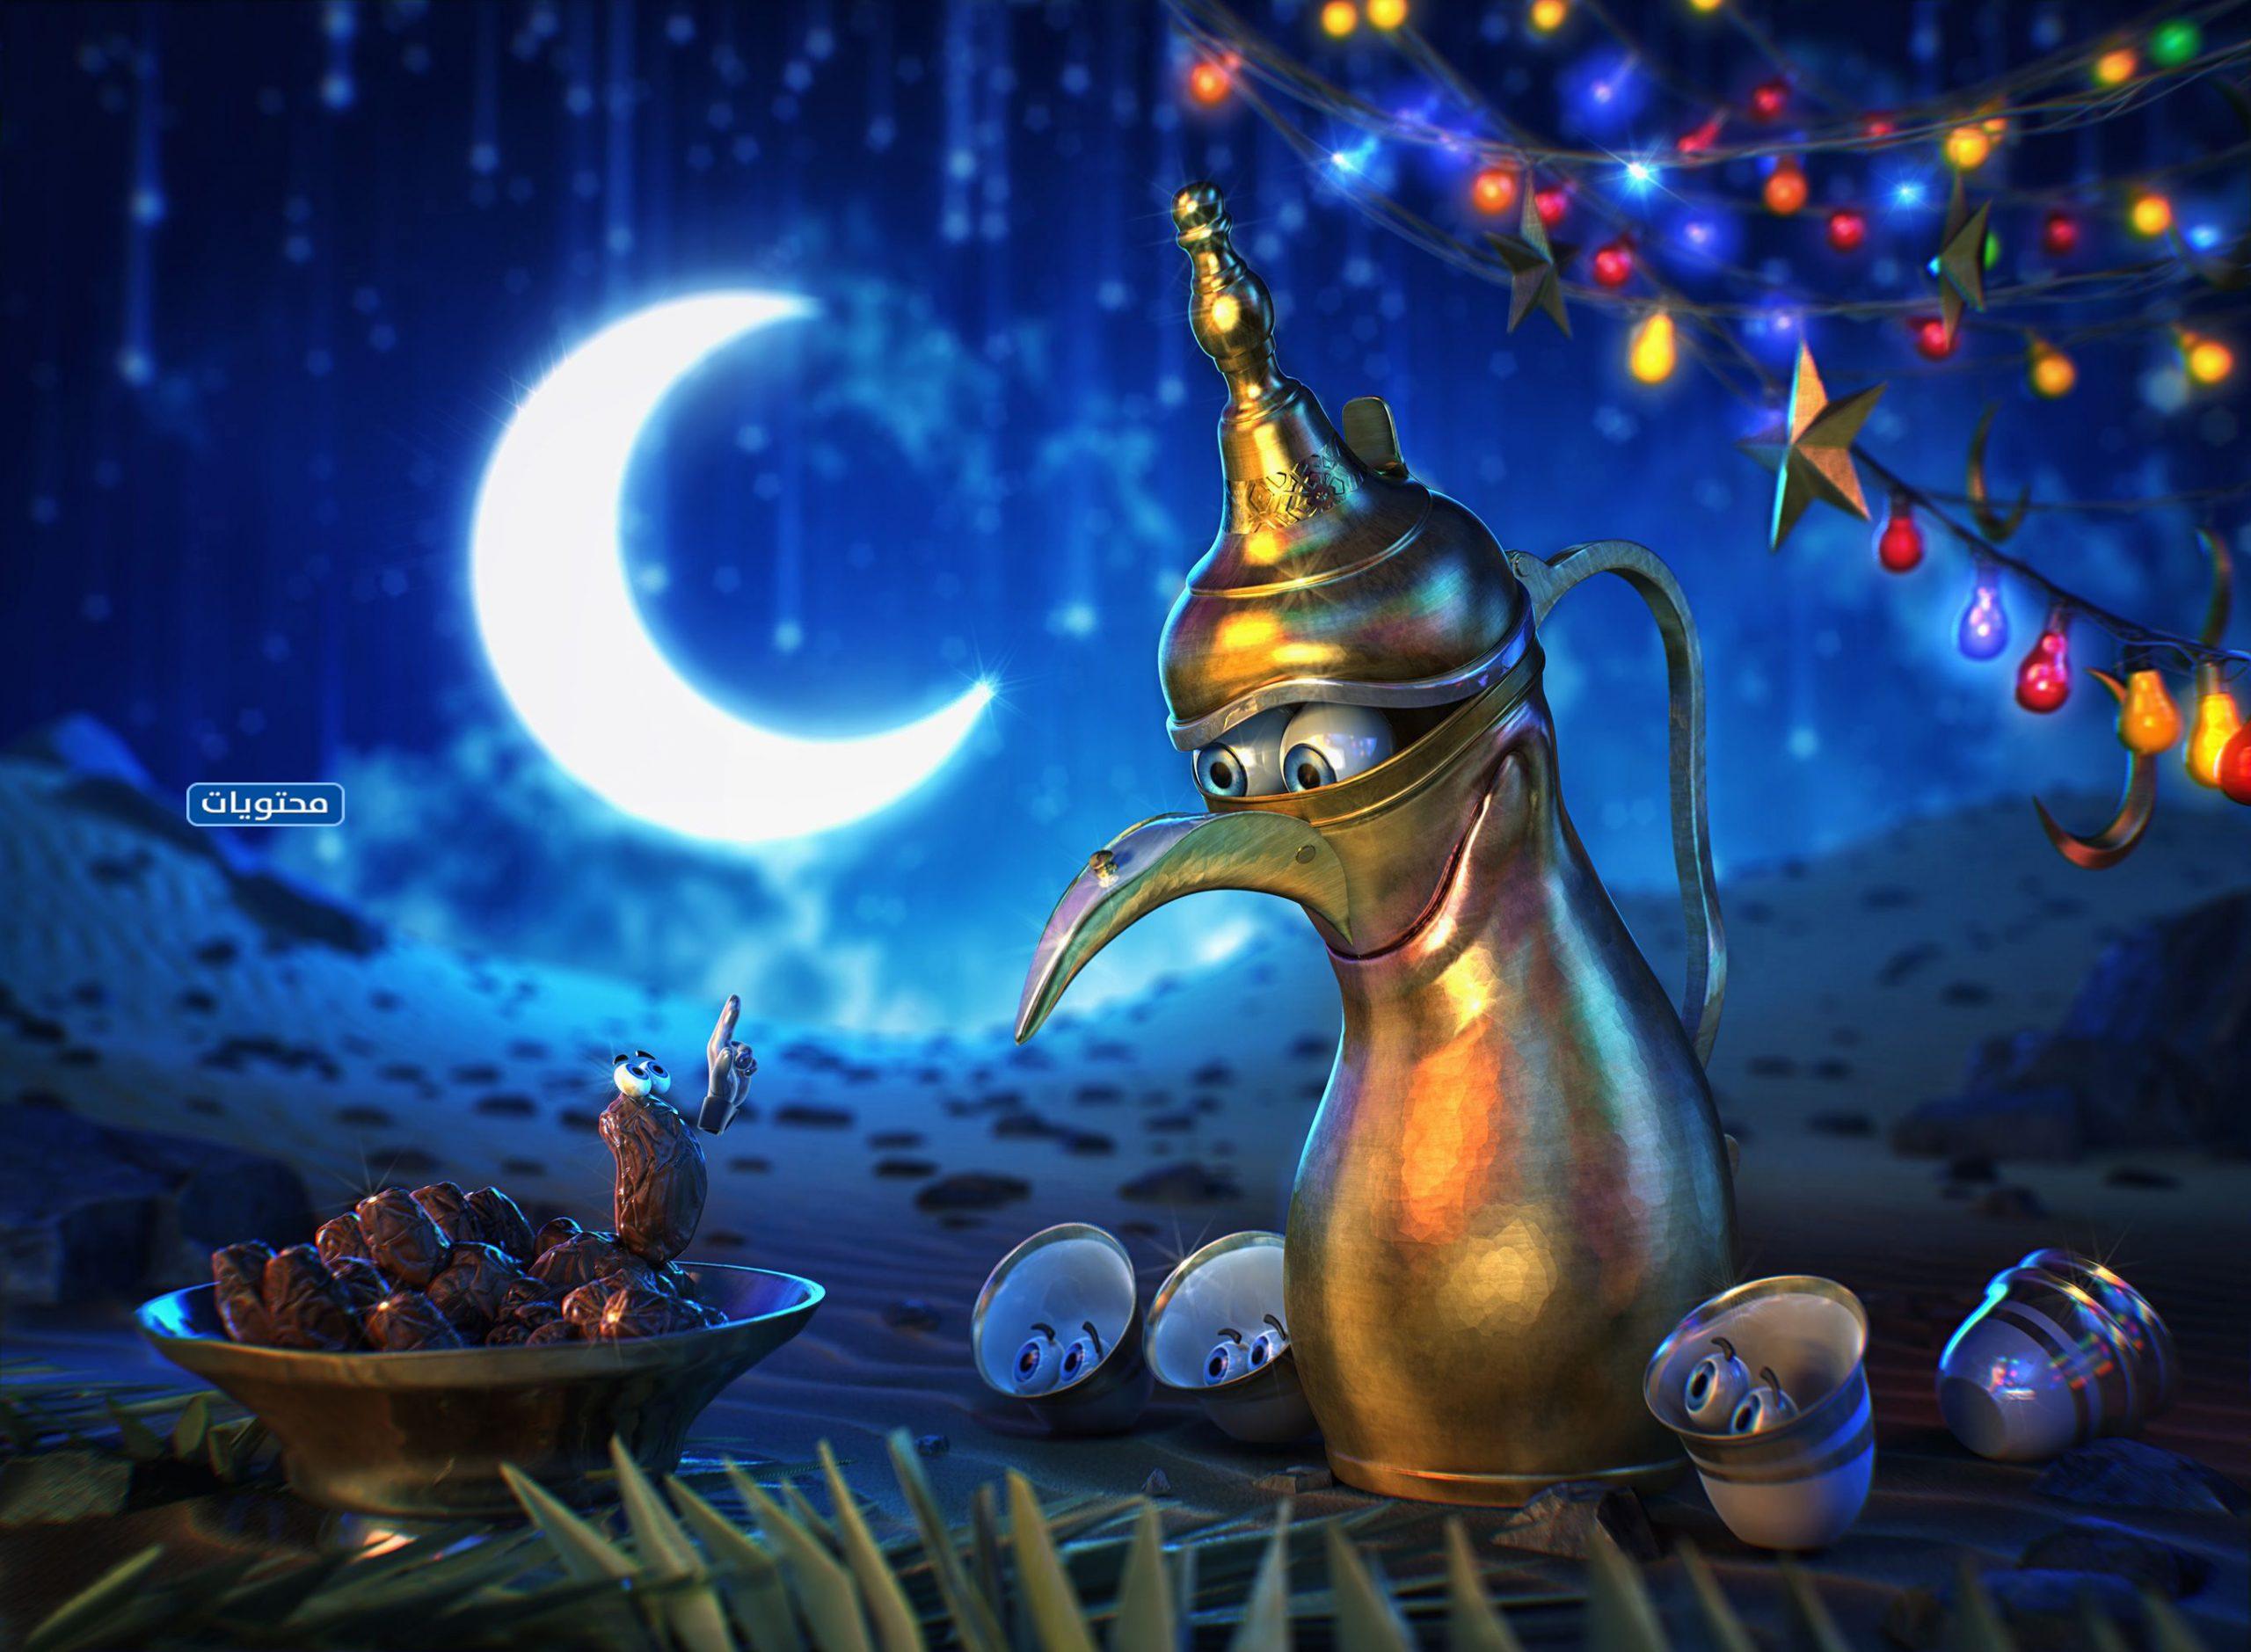 صور جميلة عن شهر رمضان 2021